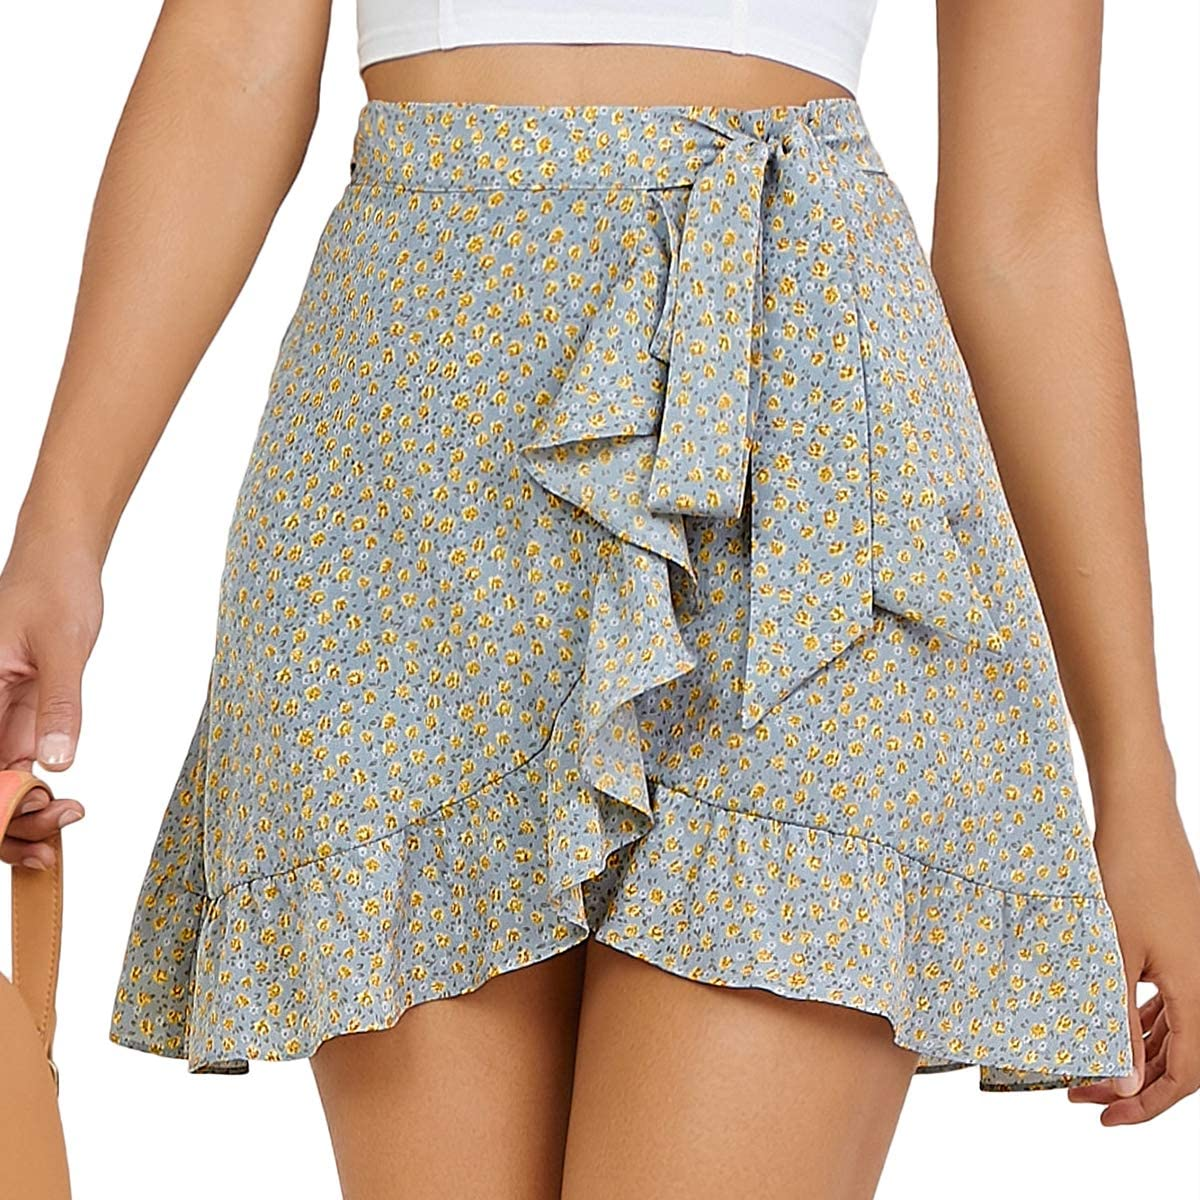 SheIn Women's Floral High Waist Ruffle Trim Wrap Tie Side A Line Short Mini Skirt